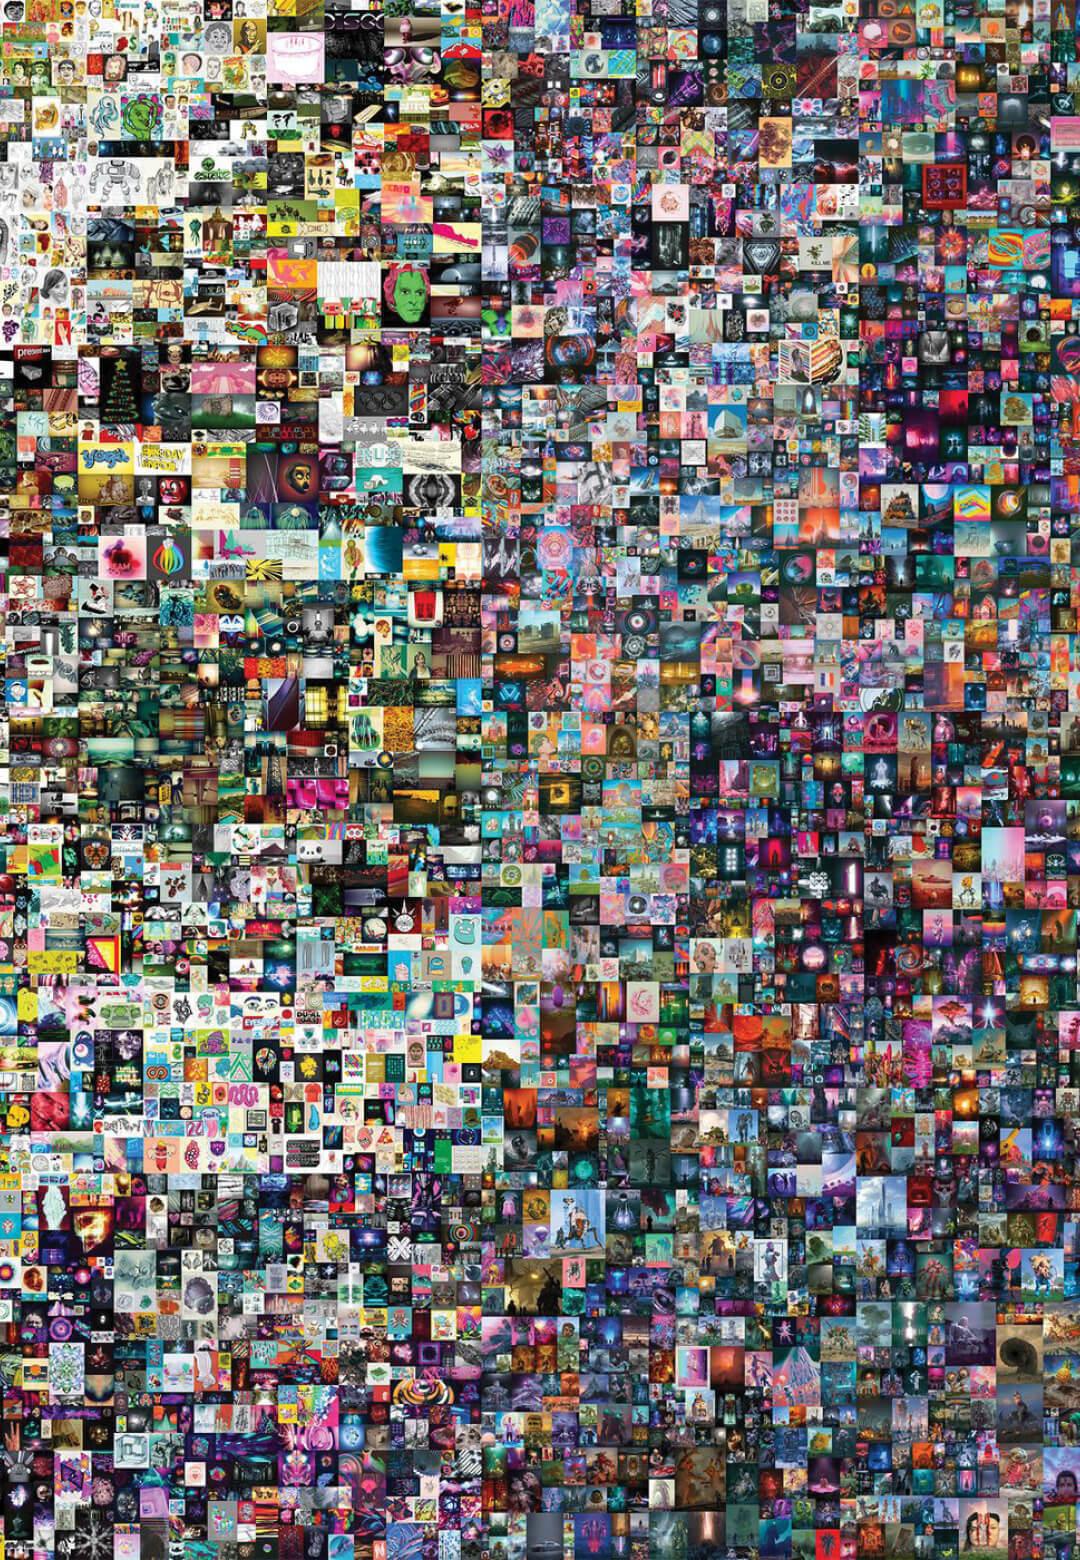 """Everydays: The First 5000 Days,"" by Mike Winkelmann | Digital Legacies | STIRworld"